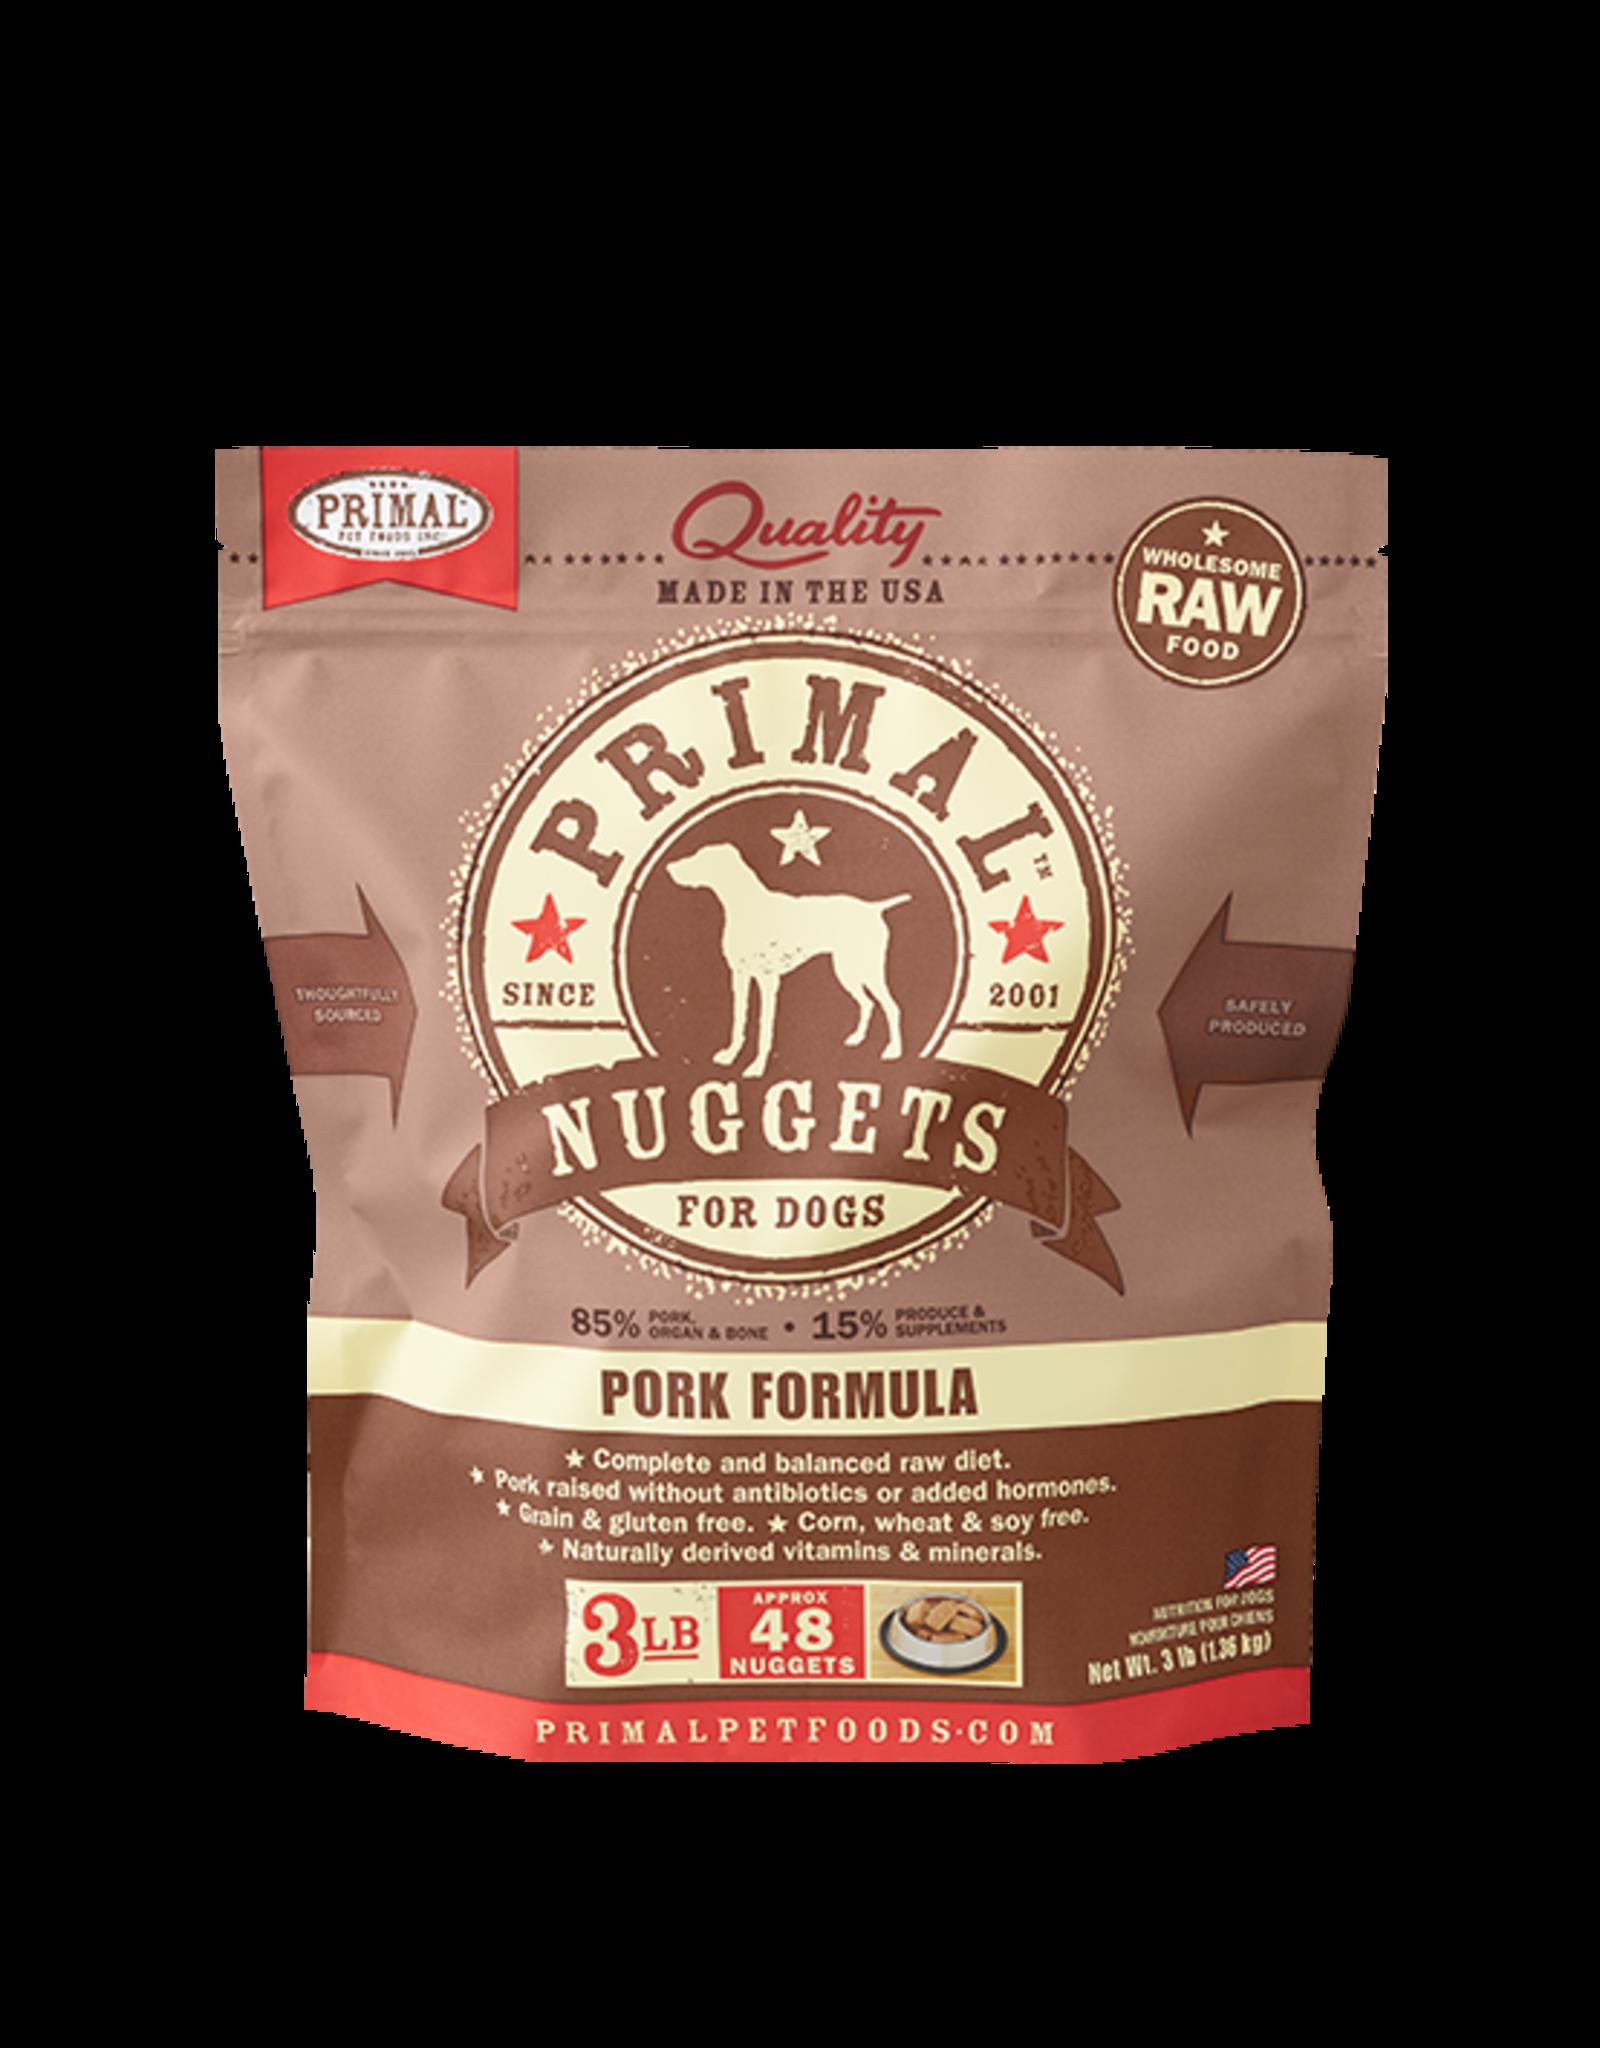 Primal Primal Frozen Canine Nuggets 3 lb